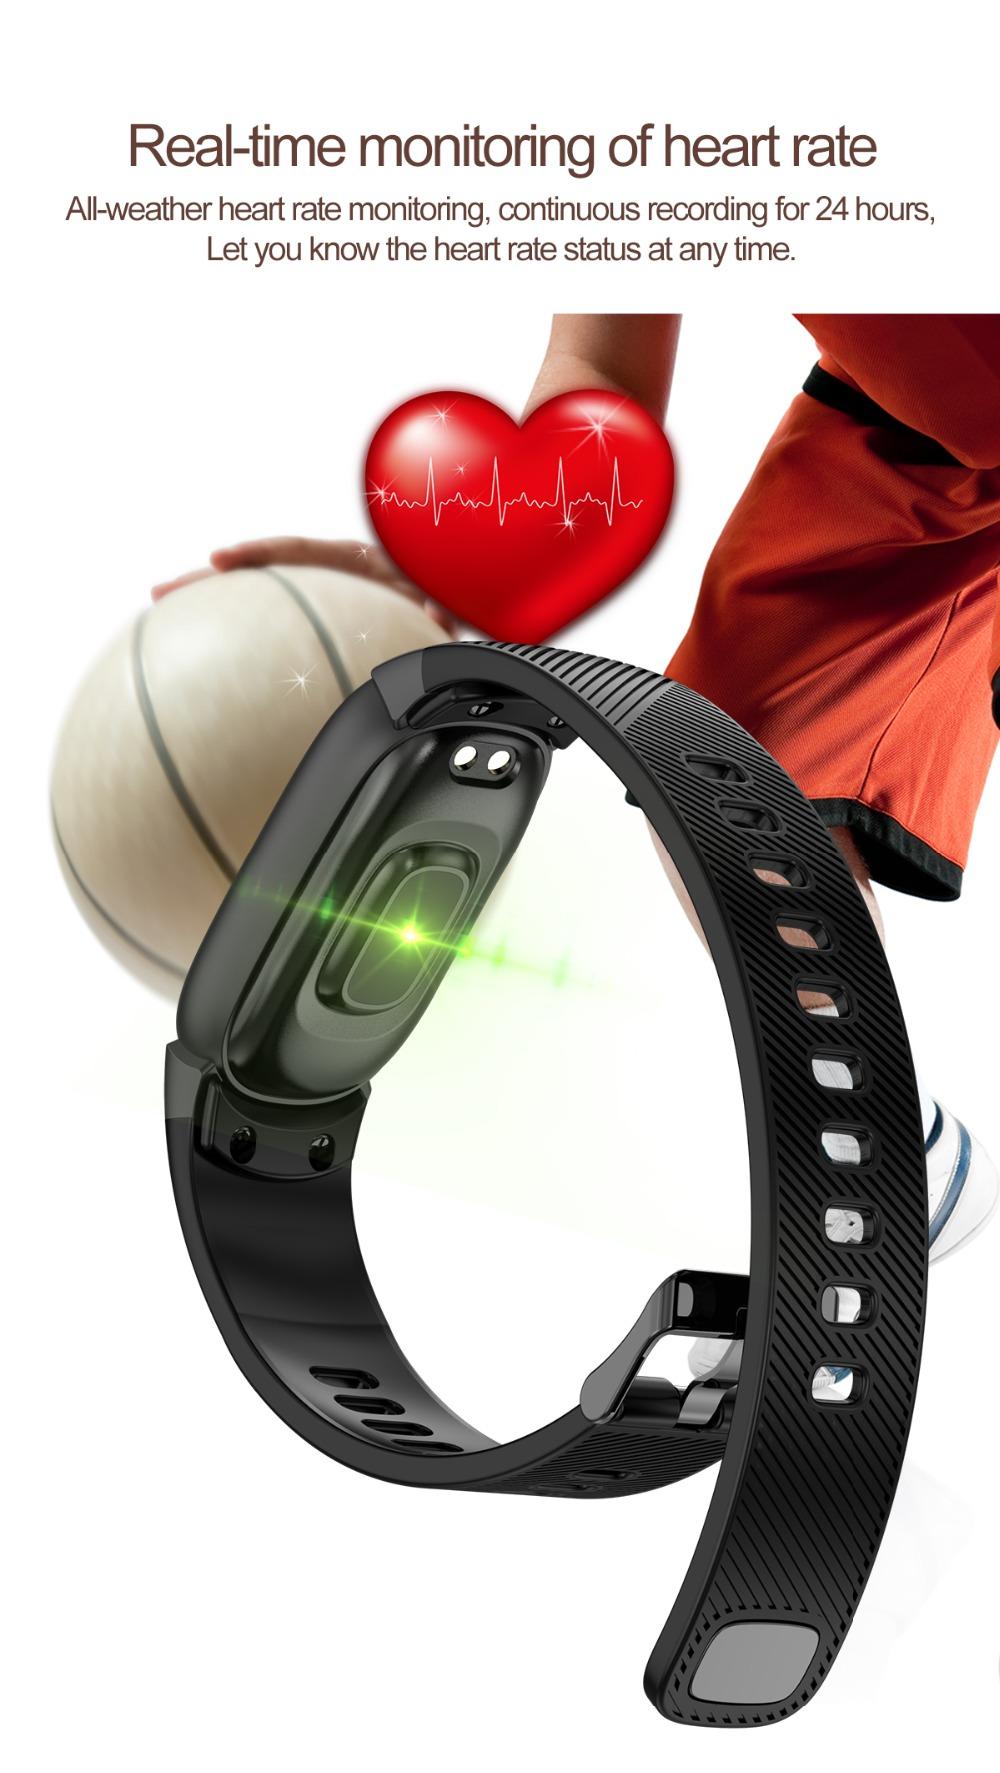 QW16 Smart Band Heart Rate Tracker Fitness Tracker Smartband Smart Bracelet Waterproof Smart Wristband Smart Watch pk mi band 3 (3)